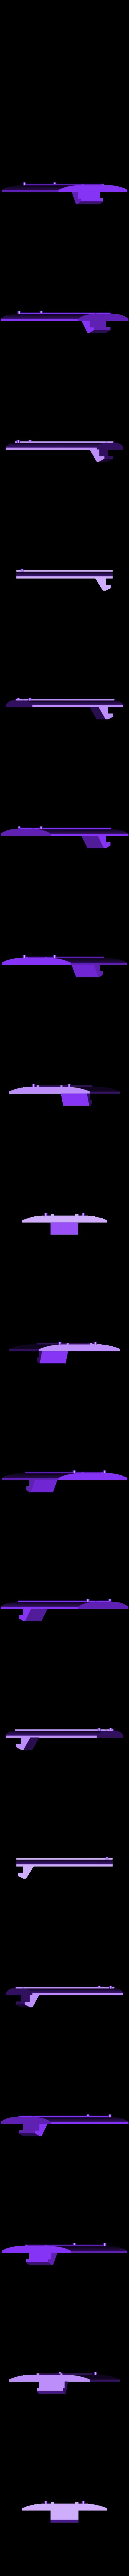 Front_hatch.STL Download free STL file K-141 Kursk • 3D print template, Rusichar